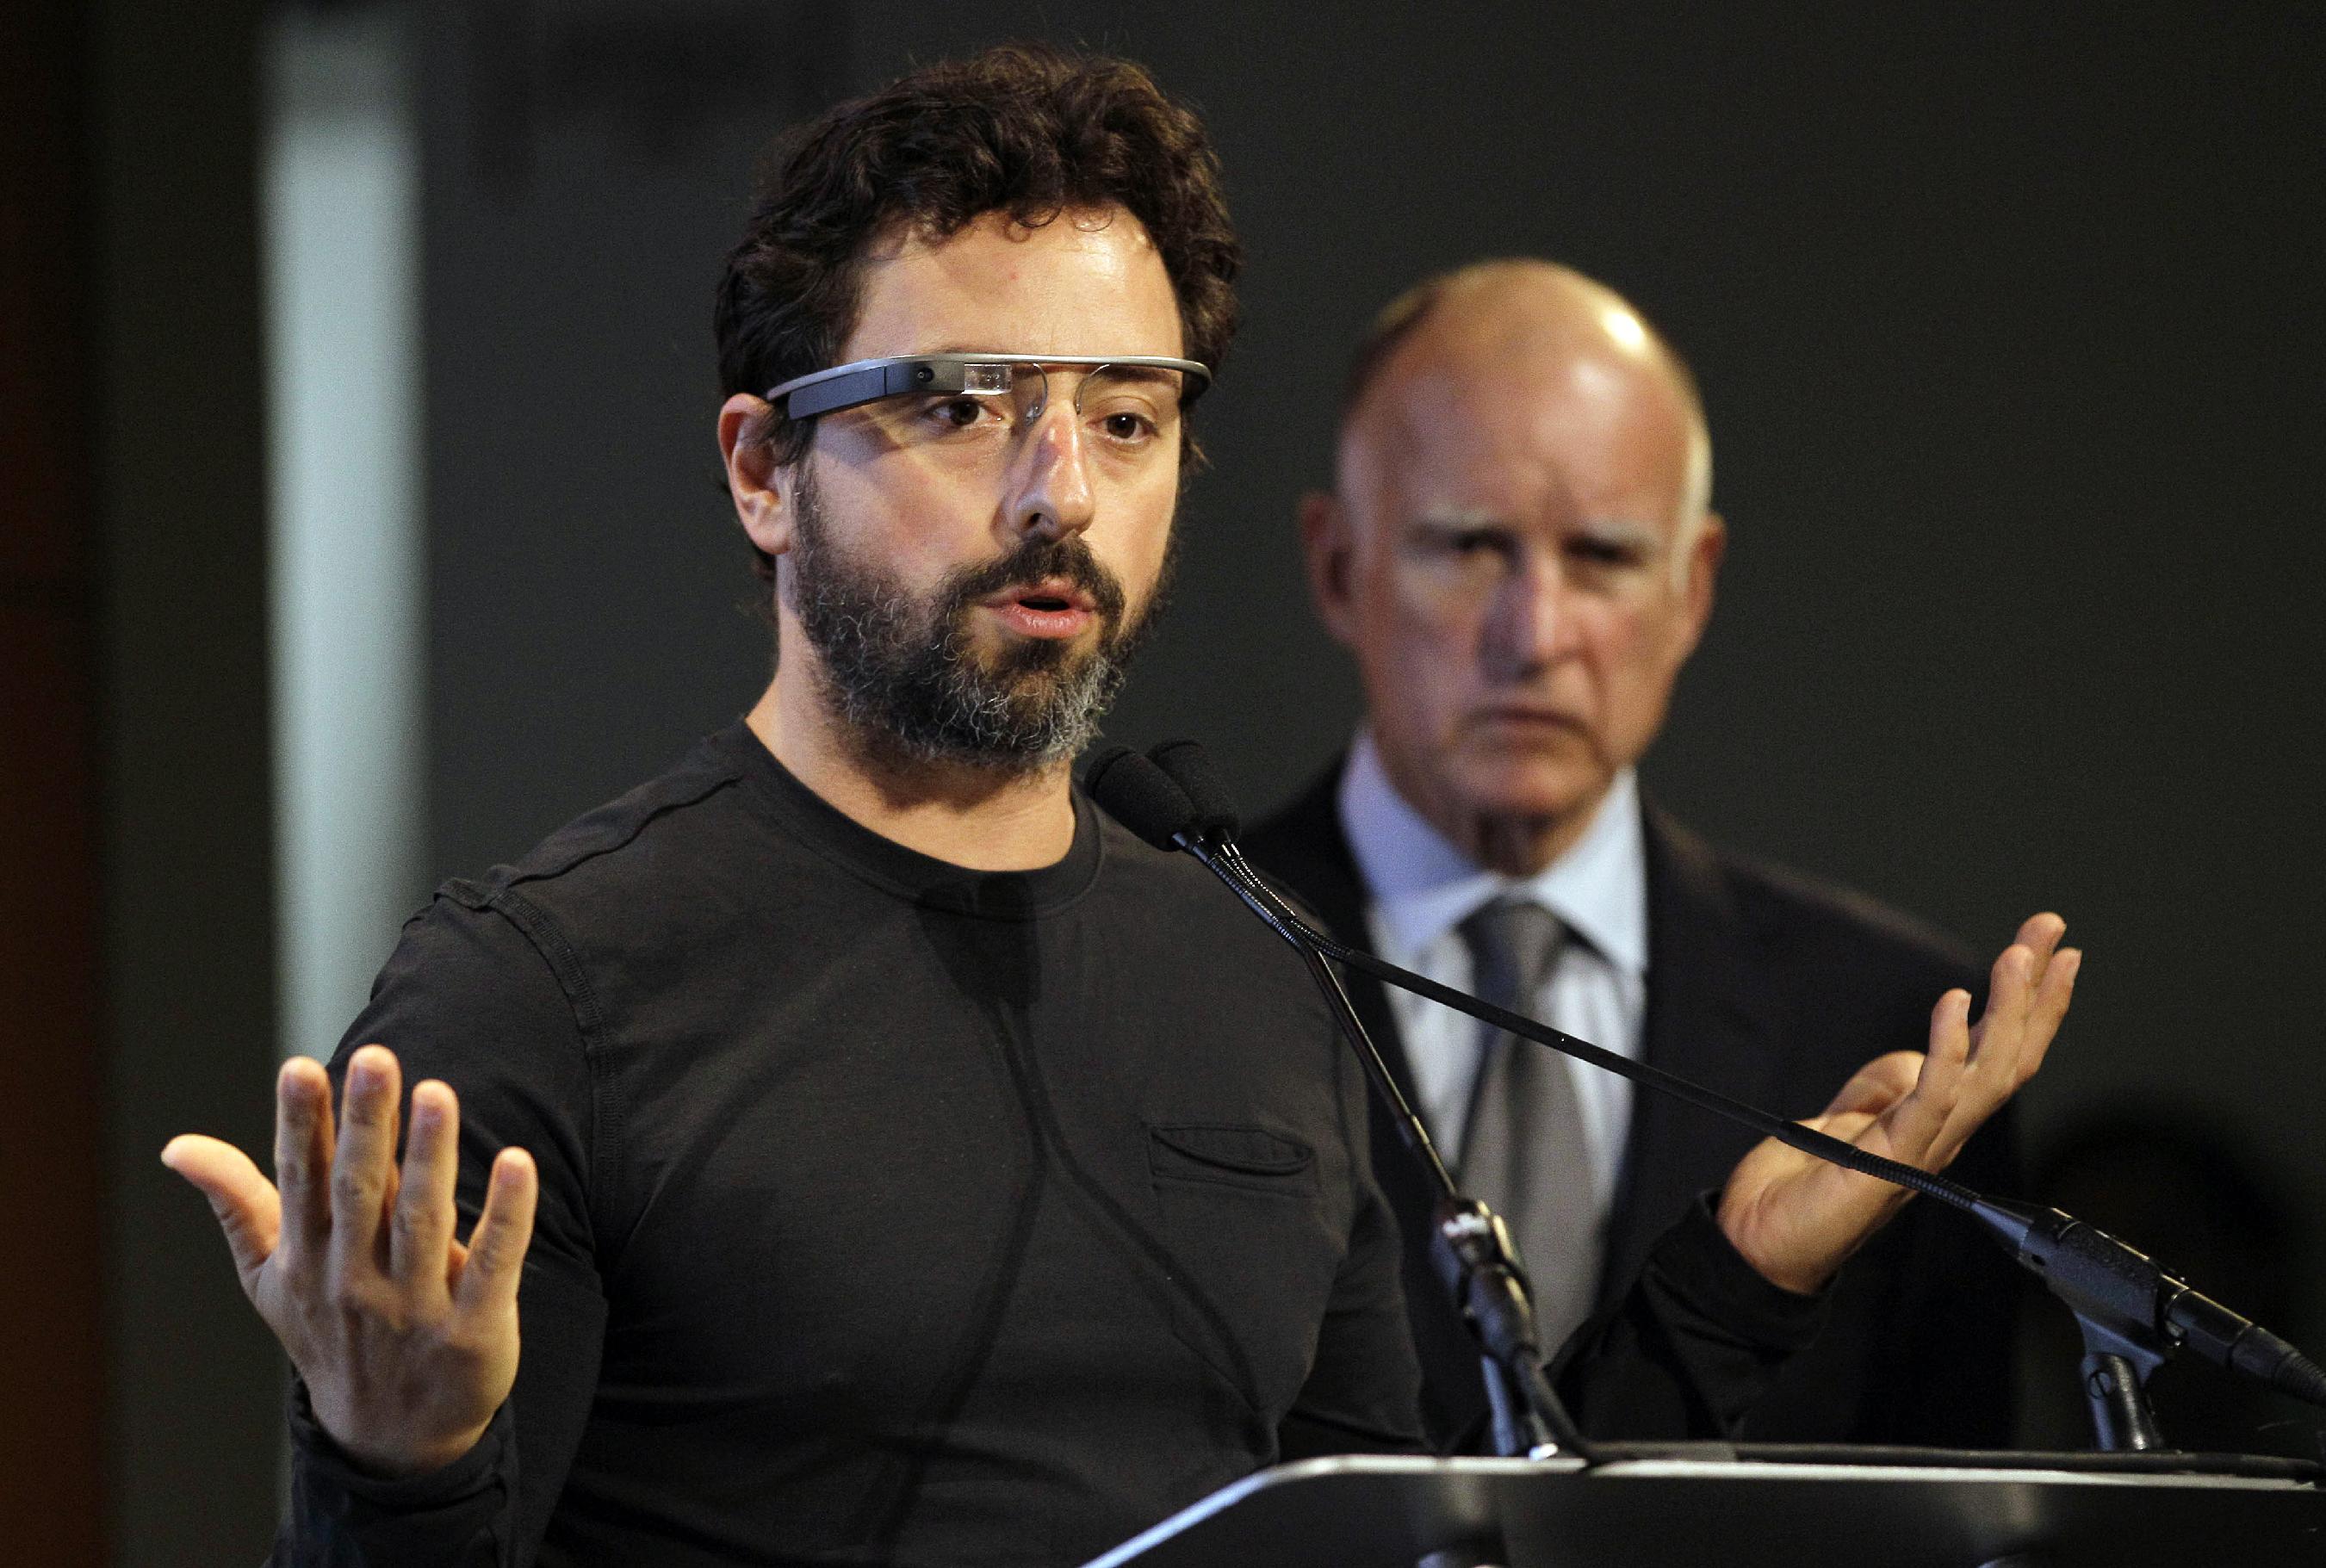 Silicon Valley struggles to speak FDA's language